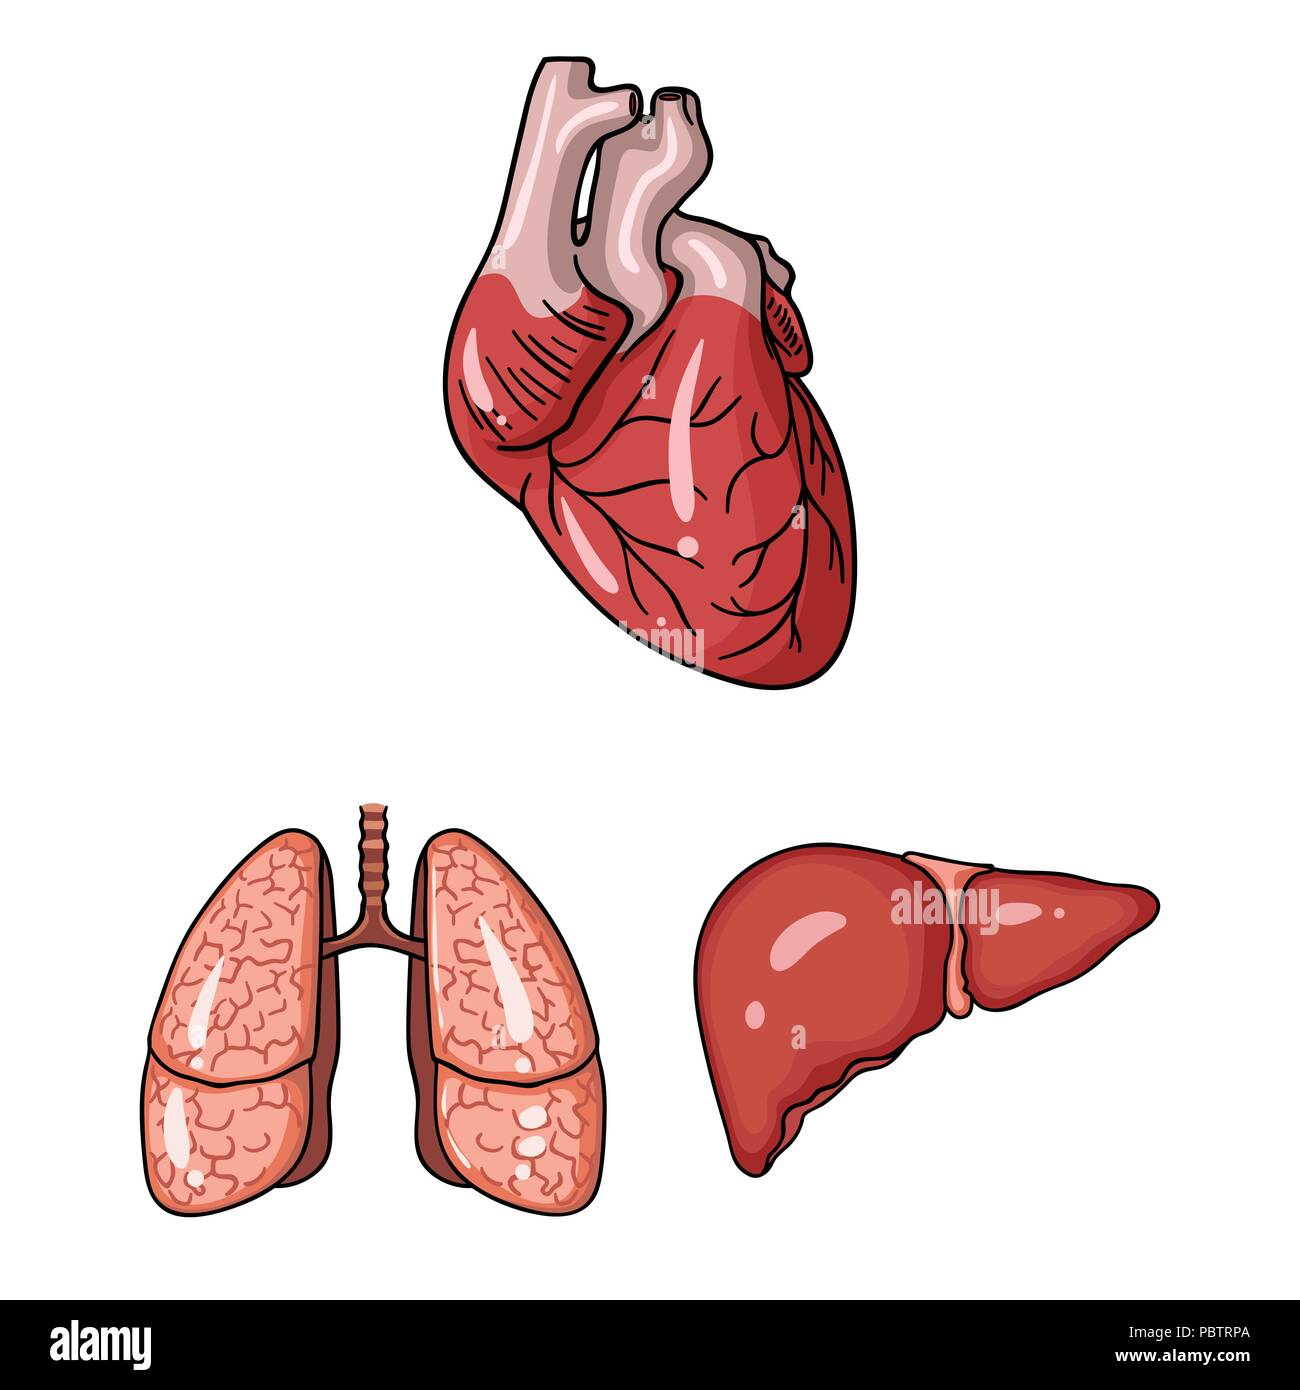 Internal Organs Icons Set Cartoon Stockfotos & Internal Organs Icons ...